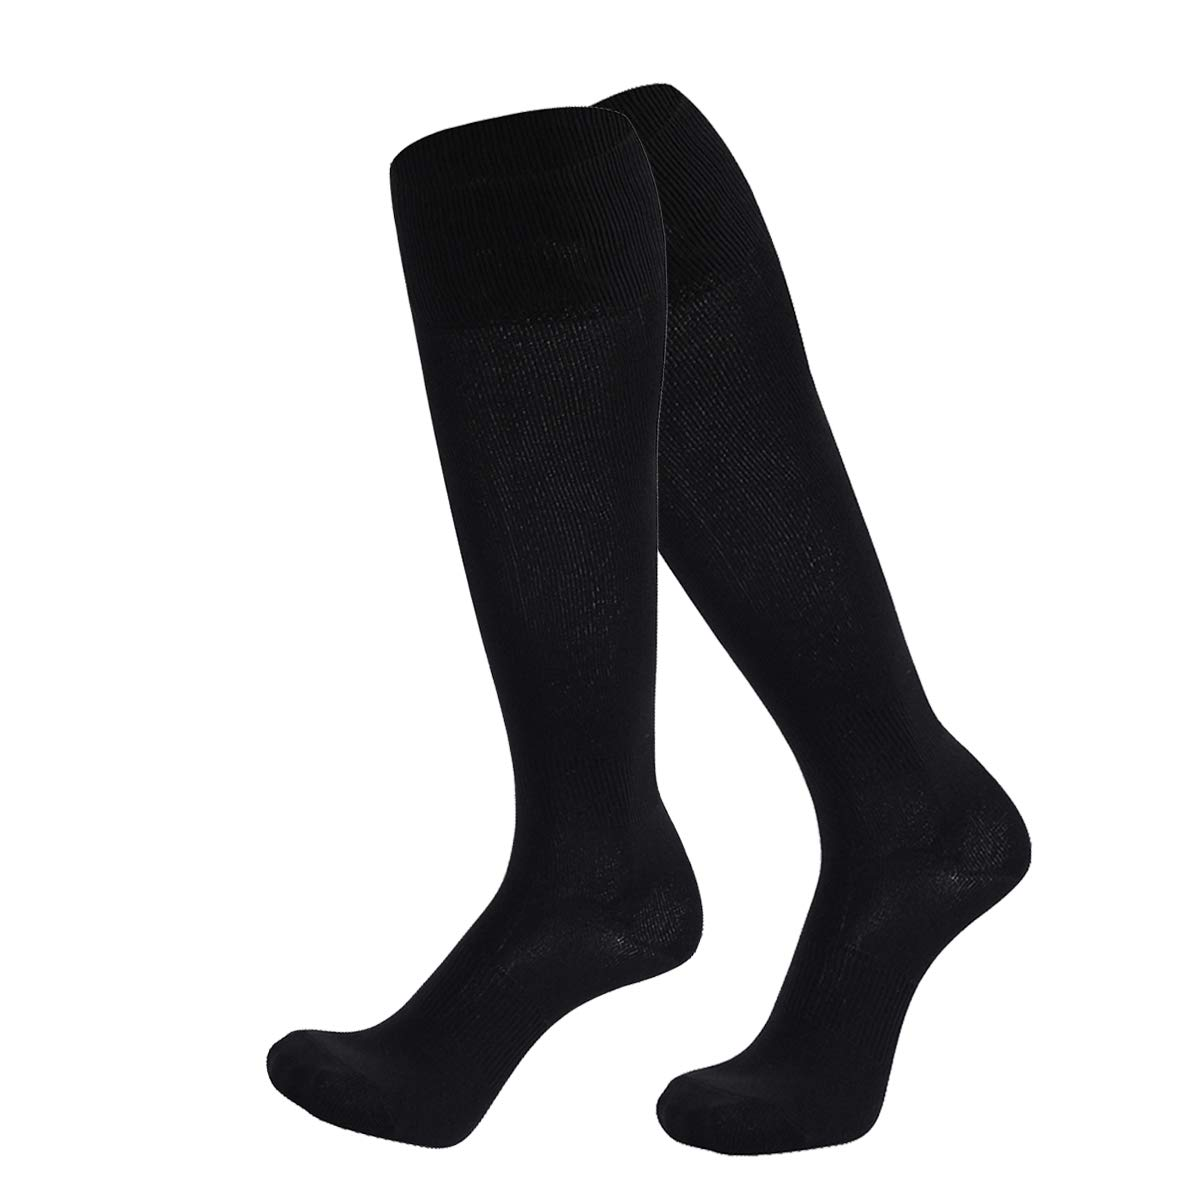 Dsource Unisex Soccer Socks Knee High Solid Baseball Football Sports Team Socks 2,6,10 Pairs